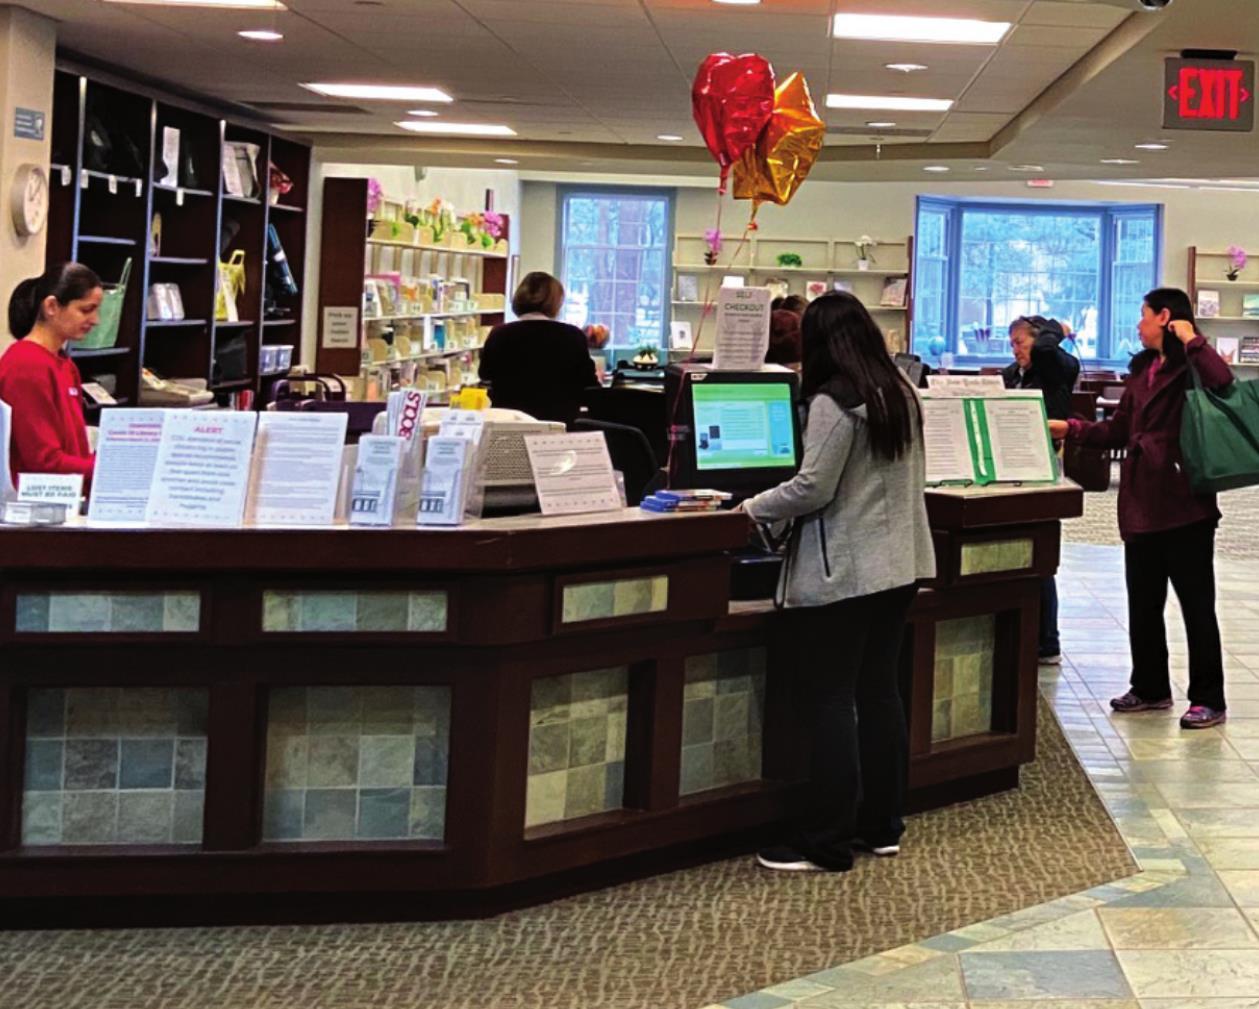 Schools Shutter, Statewide Curfew Enacted As NJ Tries to Curb Coronavirus Spread